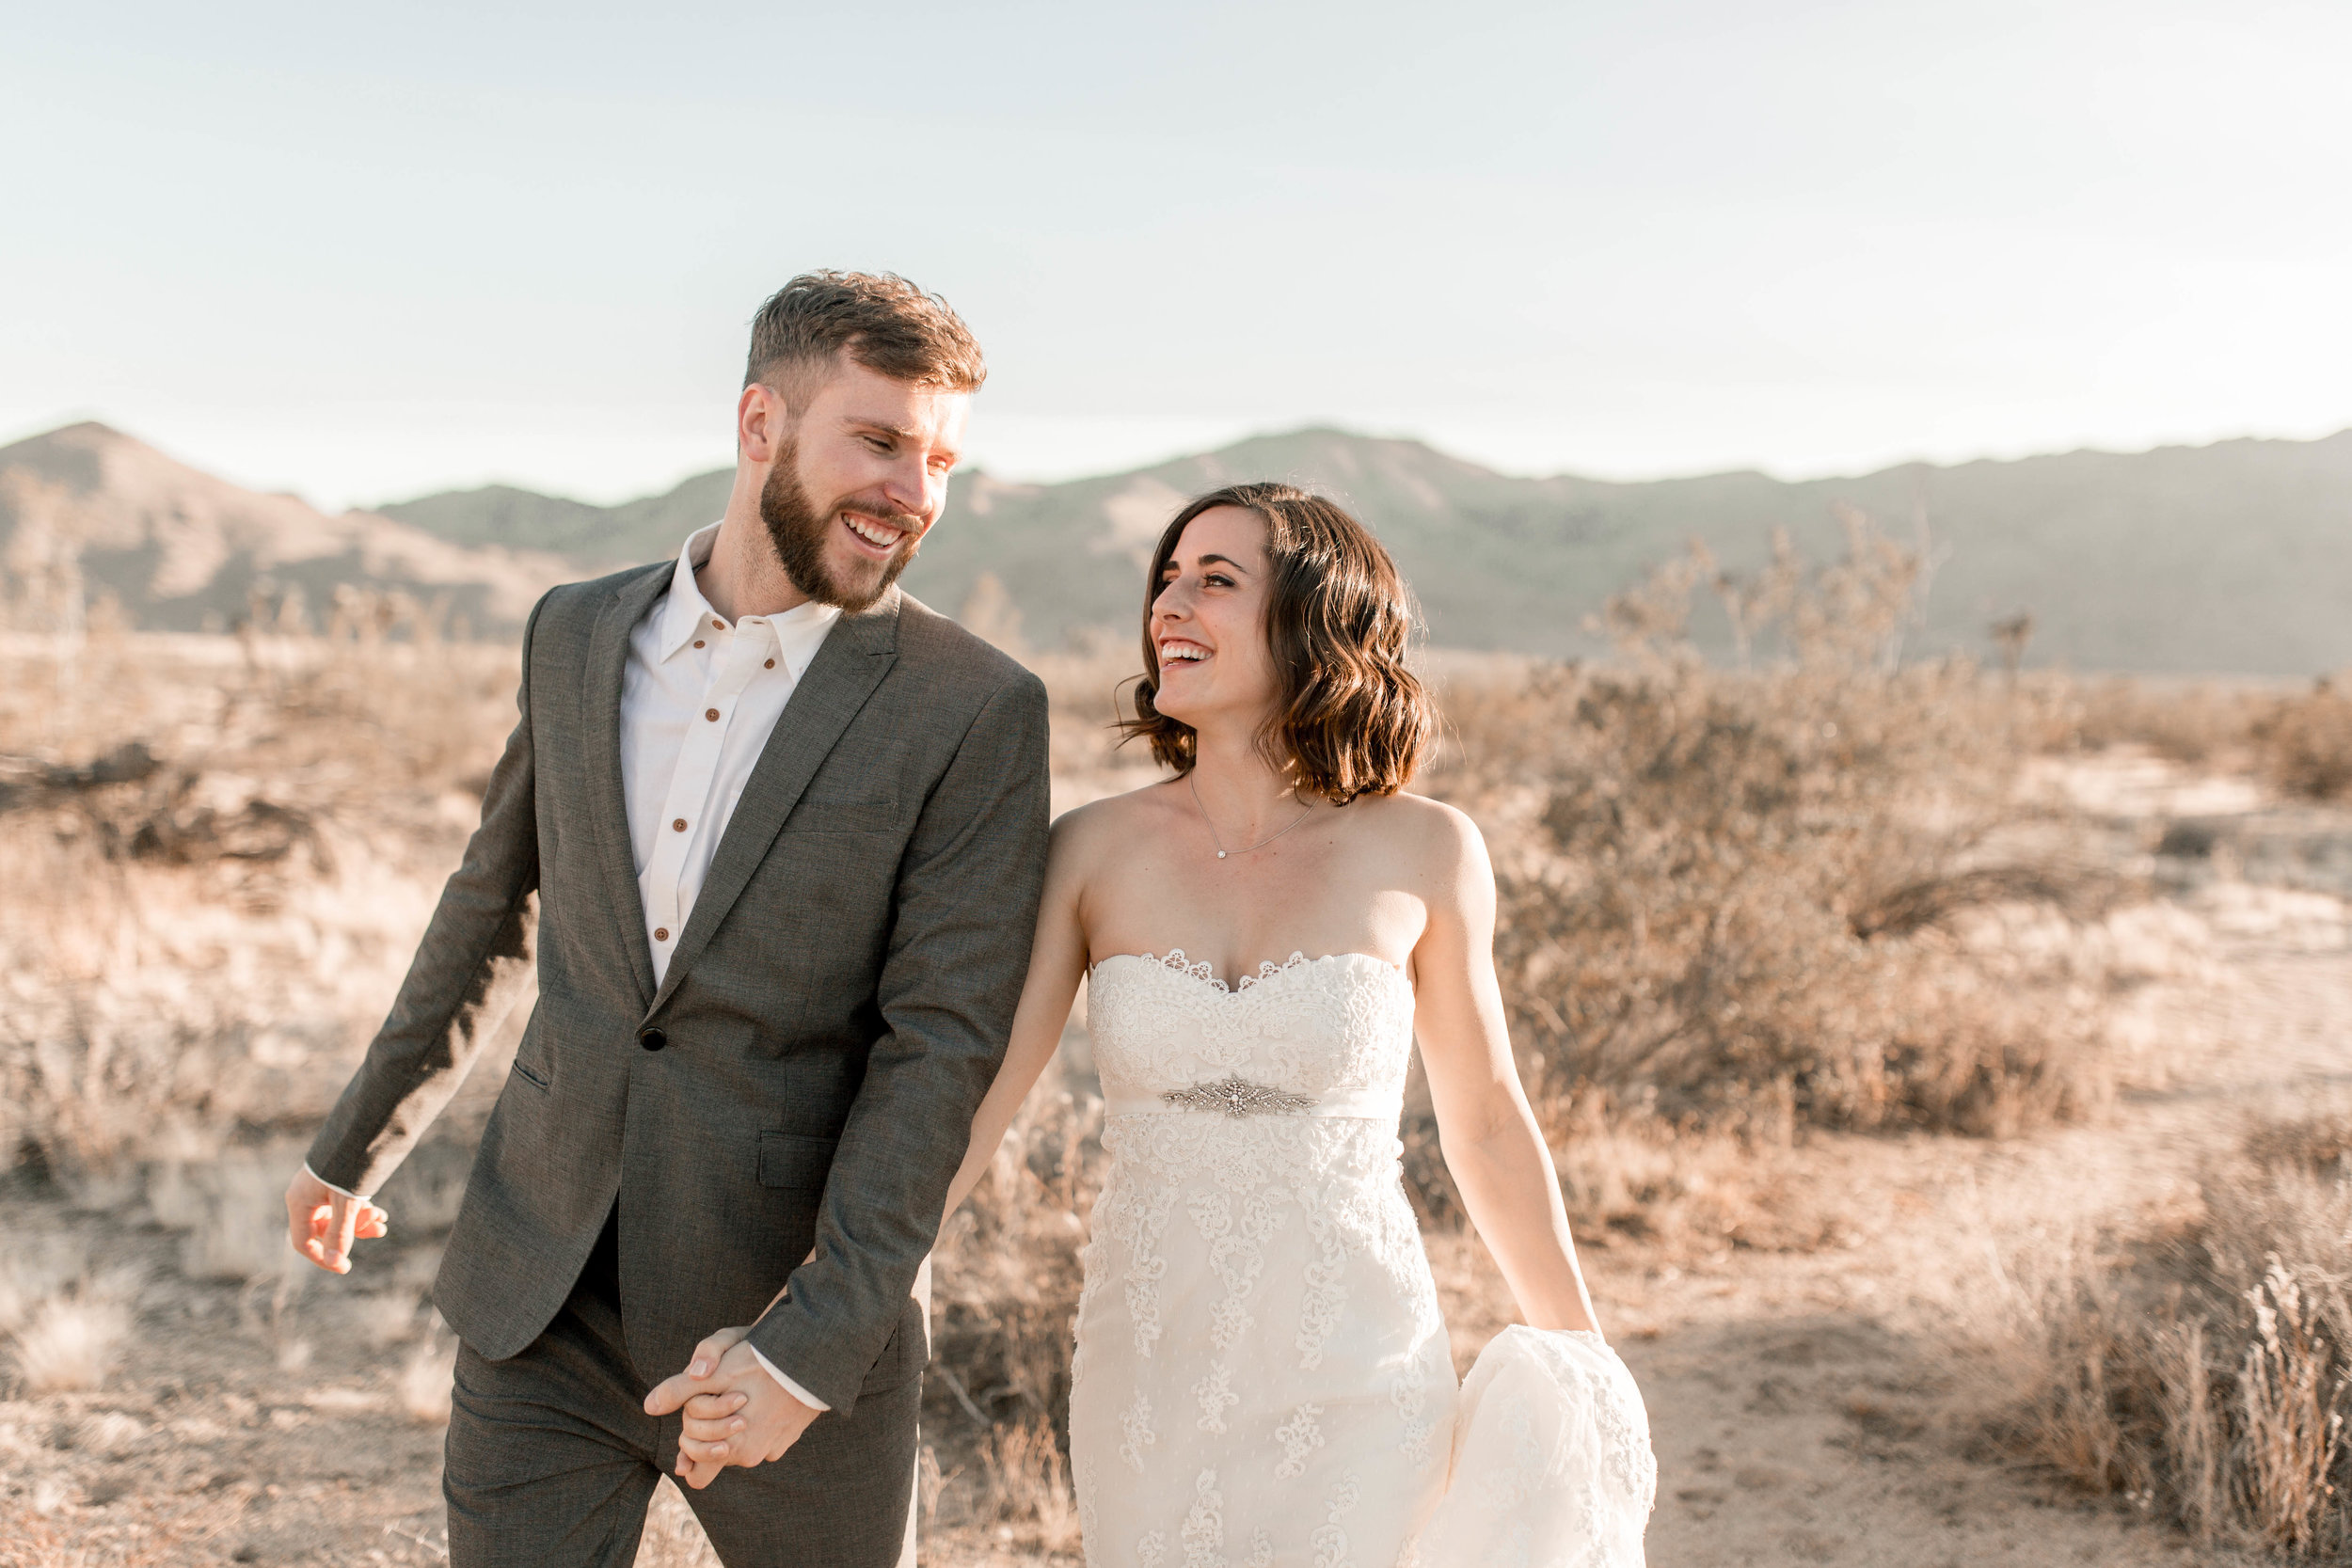 nicole-daacke-photography-joshua-tree-adventurous-elopement-wedding-national-park-wedding-photographer-adventure-wedding-adventurous-elopement-jtree-joshua-tree-national-park-wedding-photographer-intimate-weddings-golden-desert-love-18.jpg